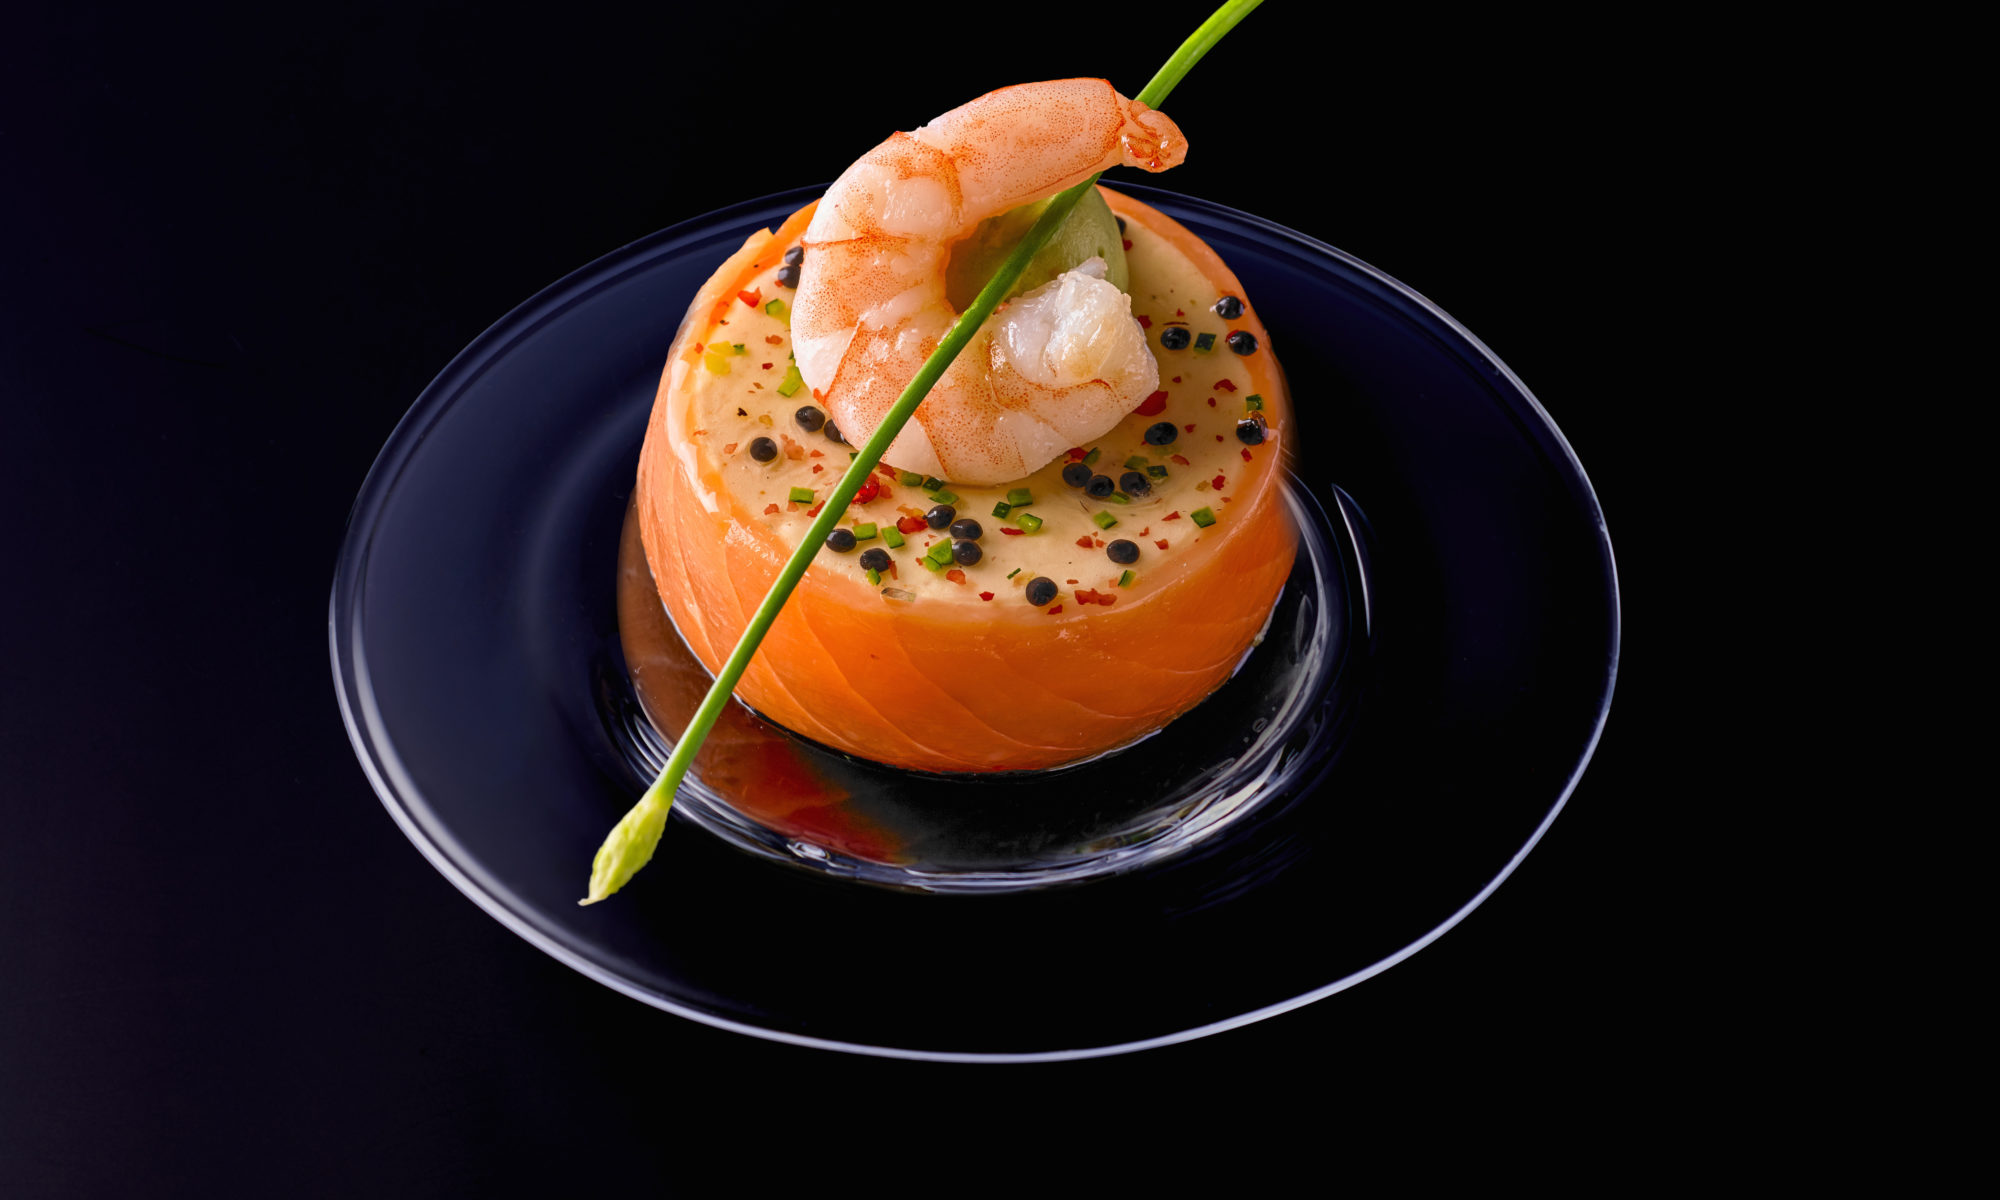 Zdjęcia potraw fotografia kulinarna menu stockfood